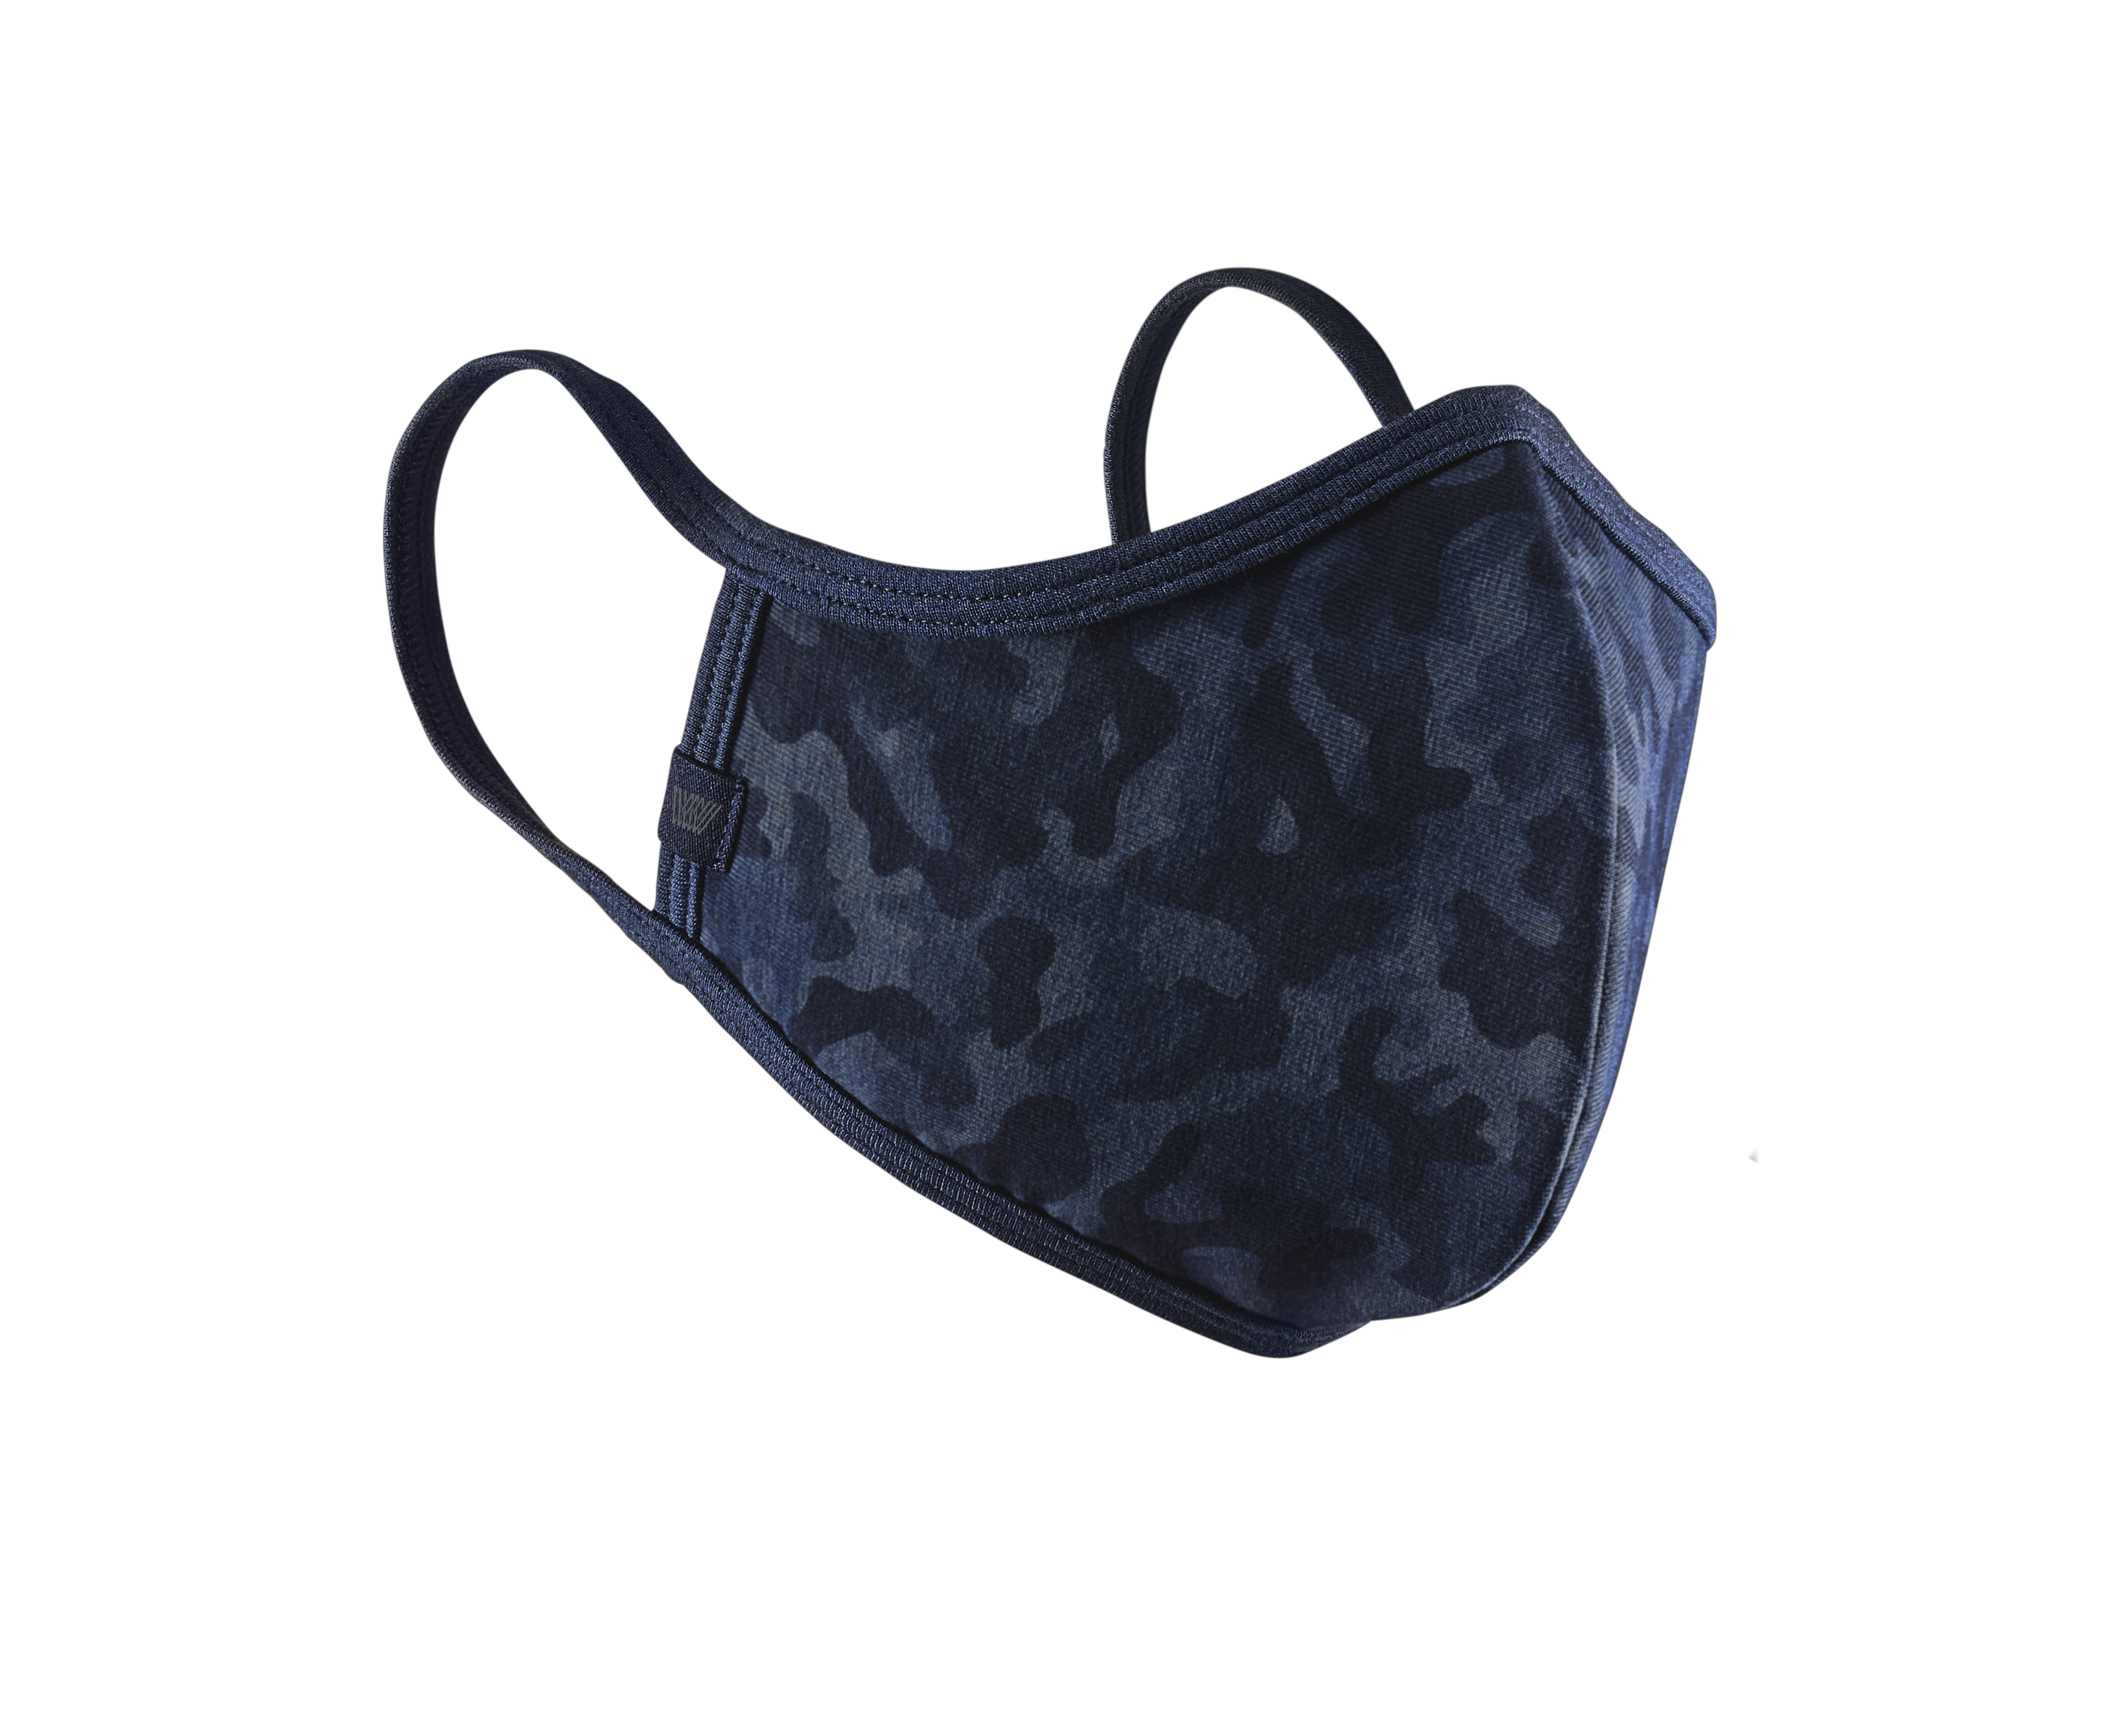 mack weldon silver mask